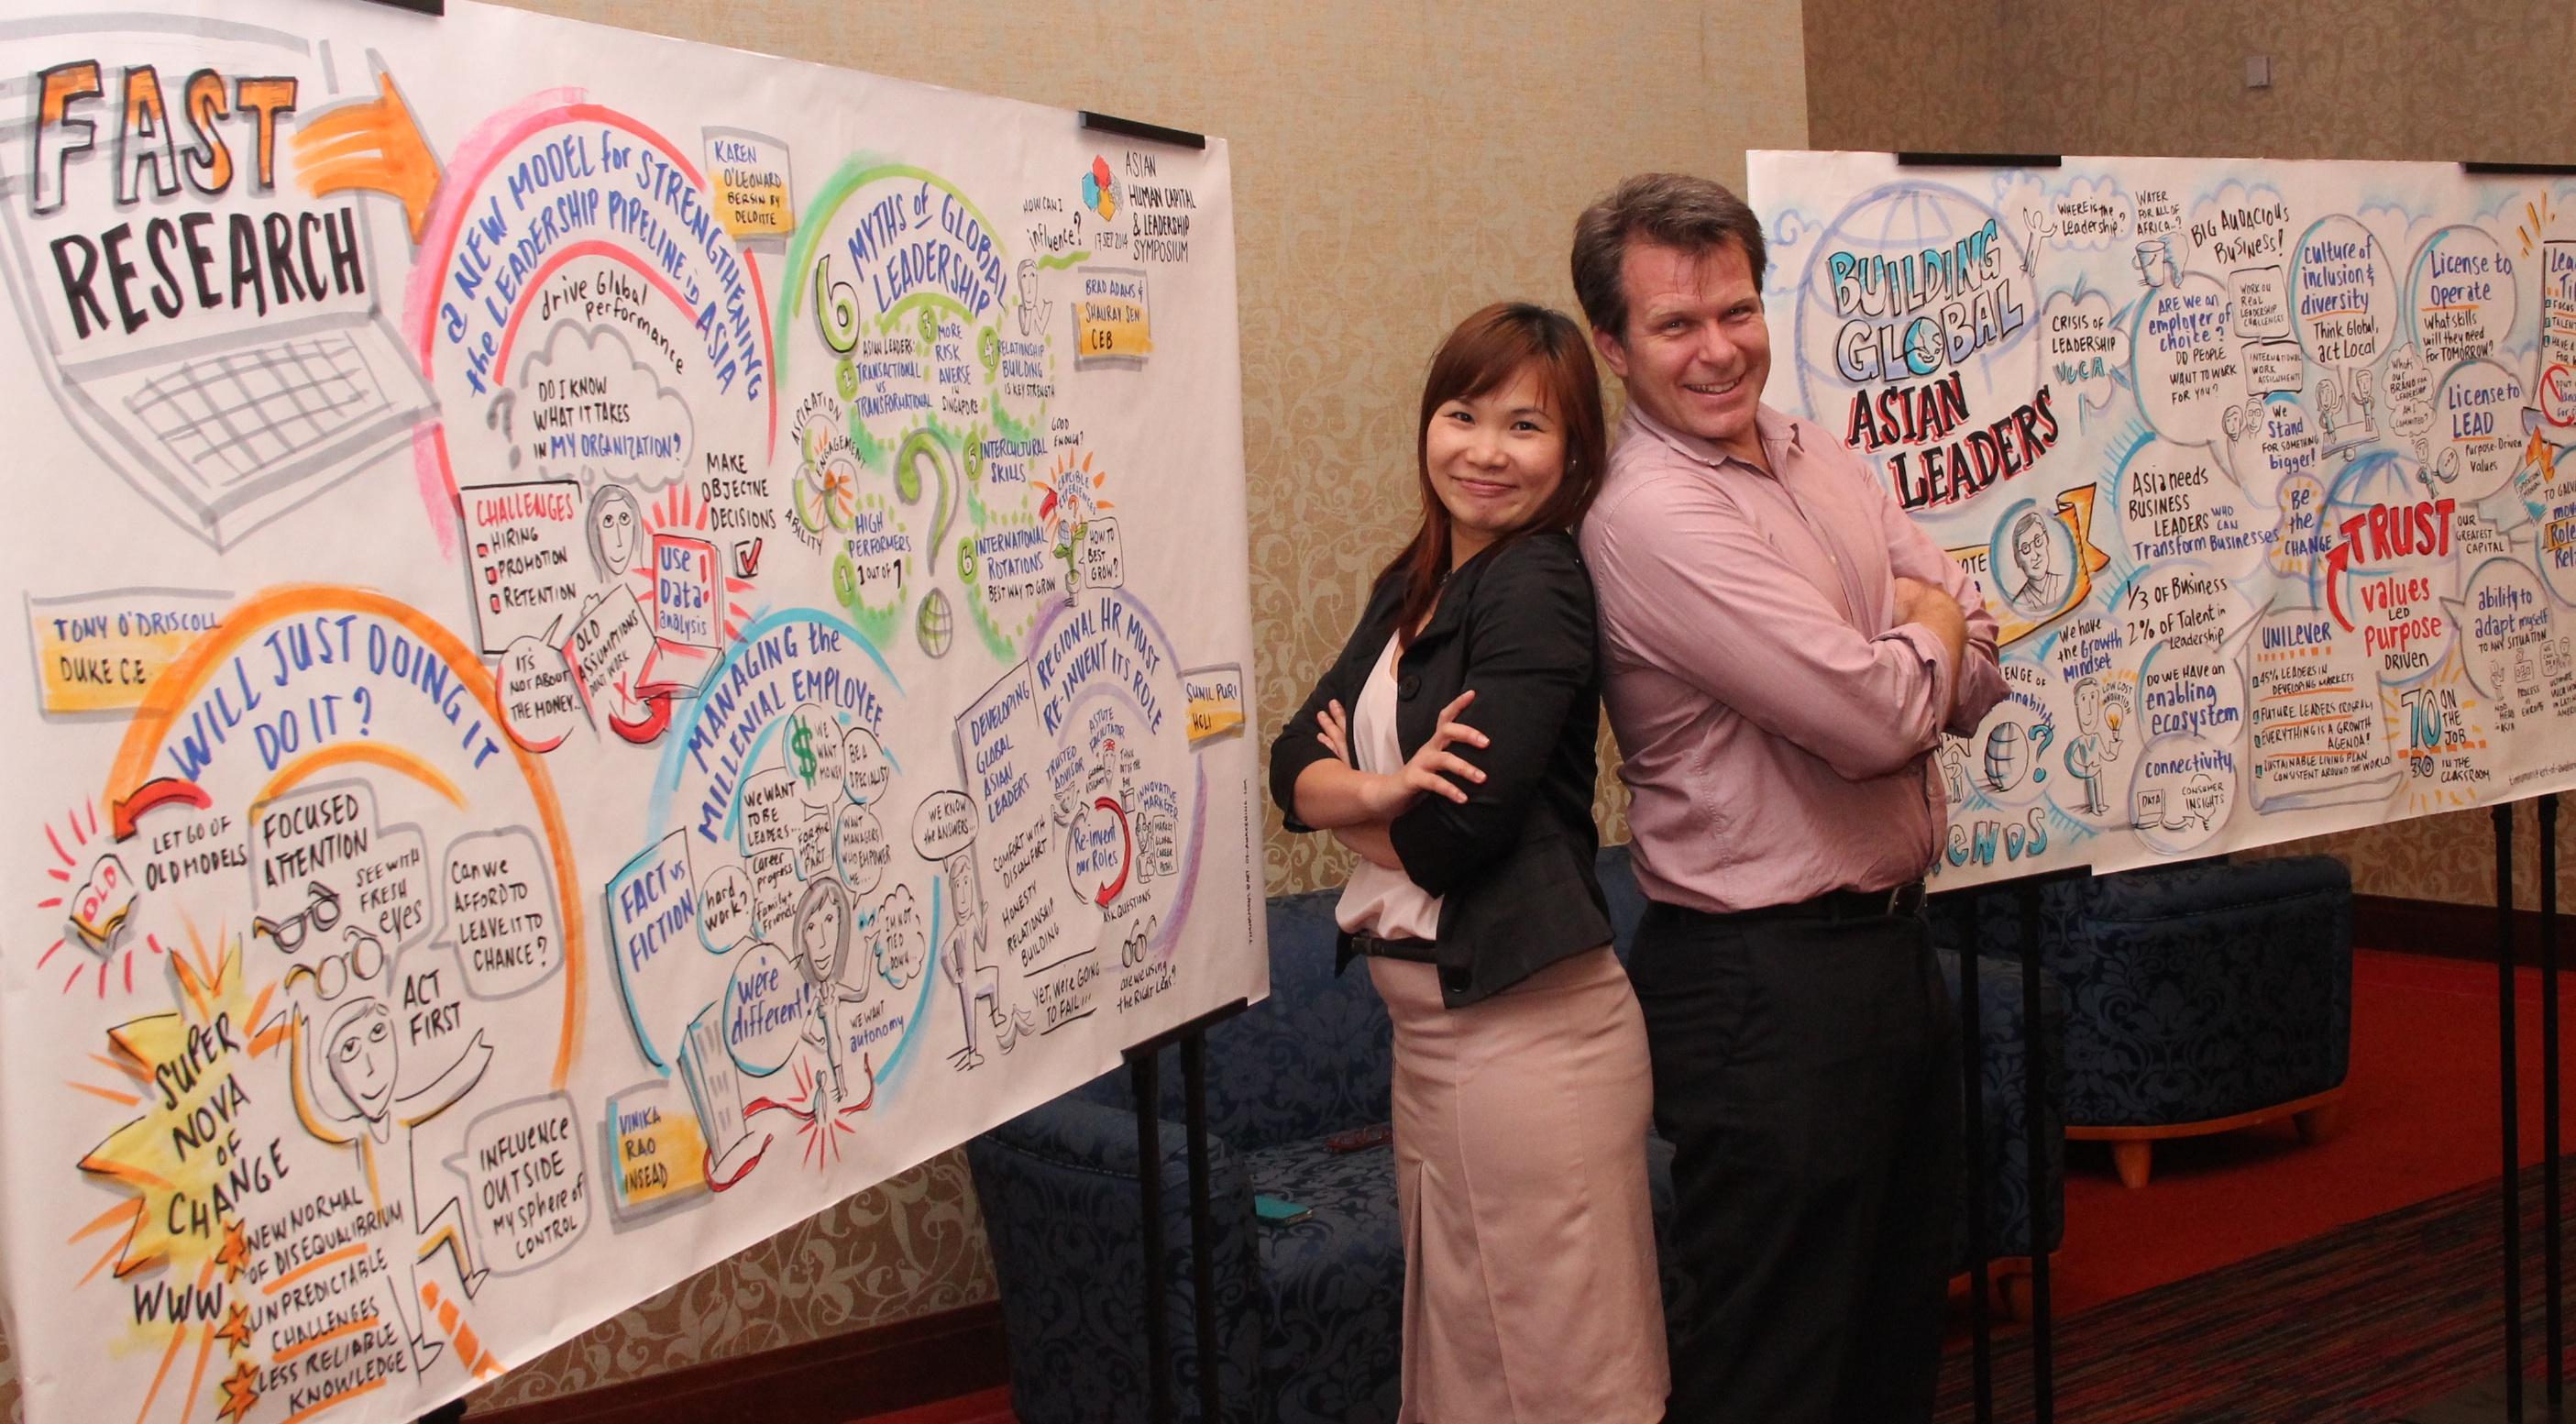 HCLI Symposium 2015